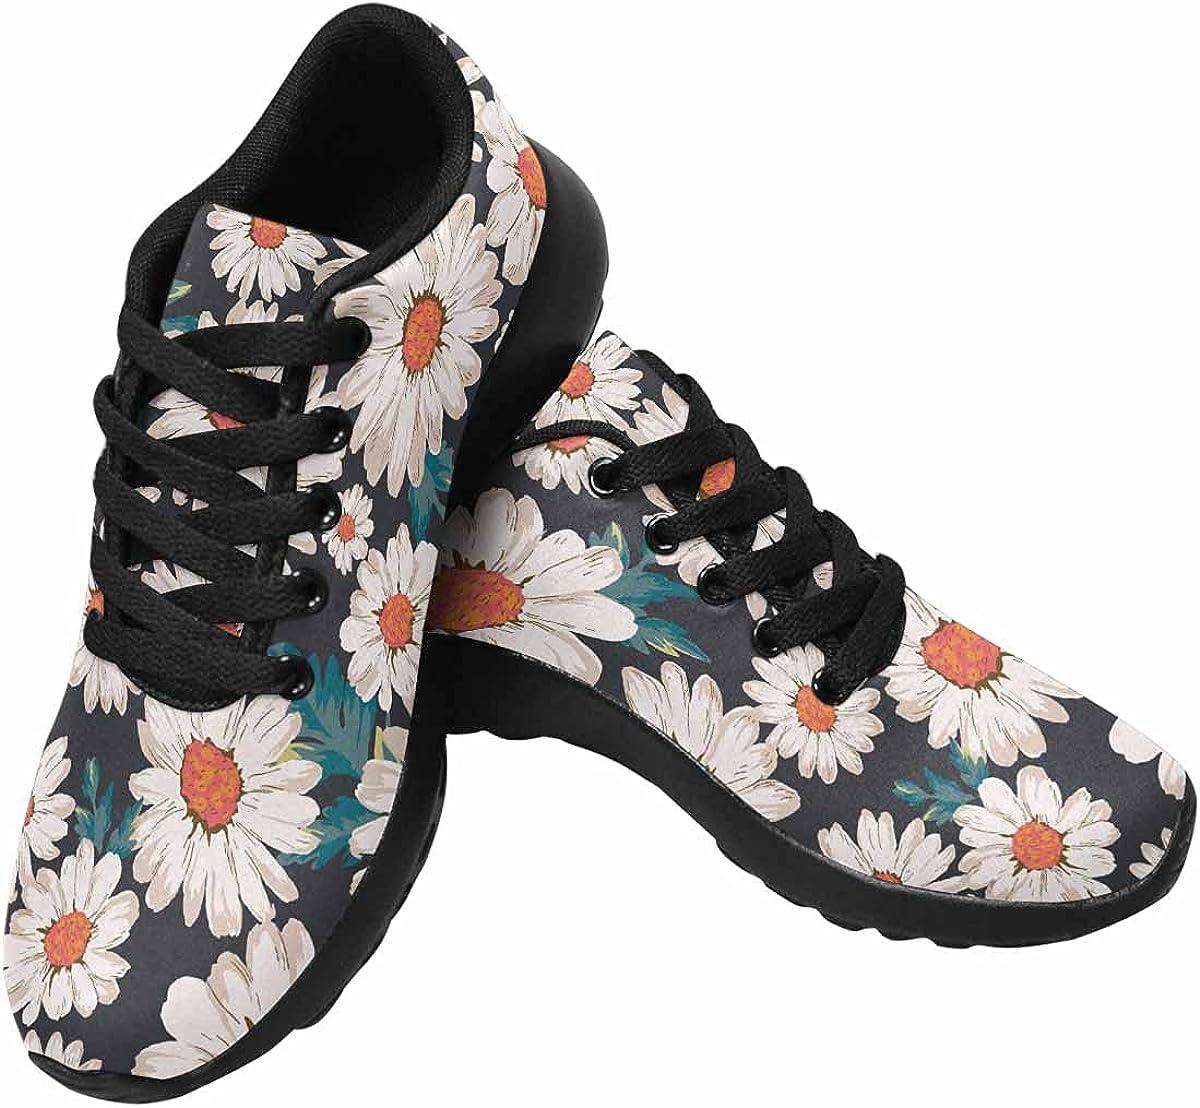 InterestPrint Womens Sneakers Lightweight Comfort Sneakers for Running Blooming Pink Flowers